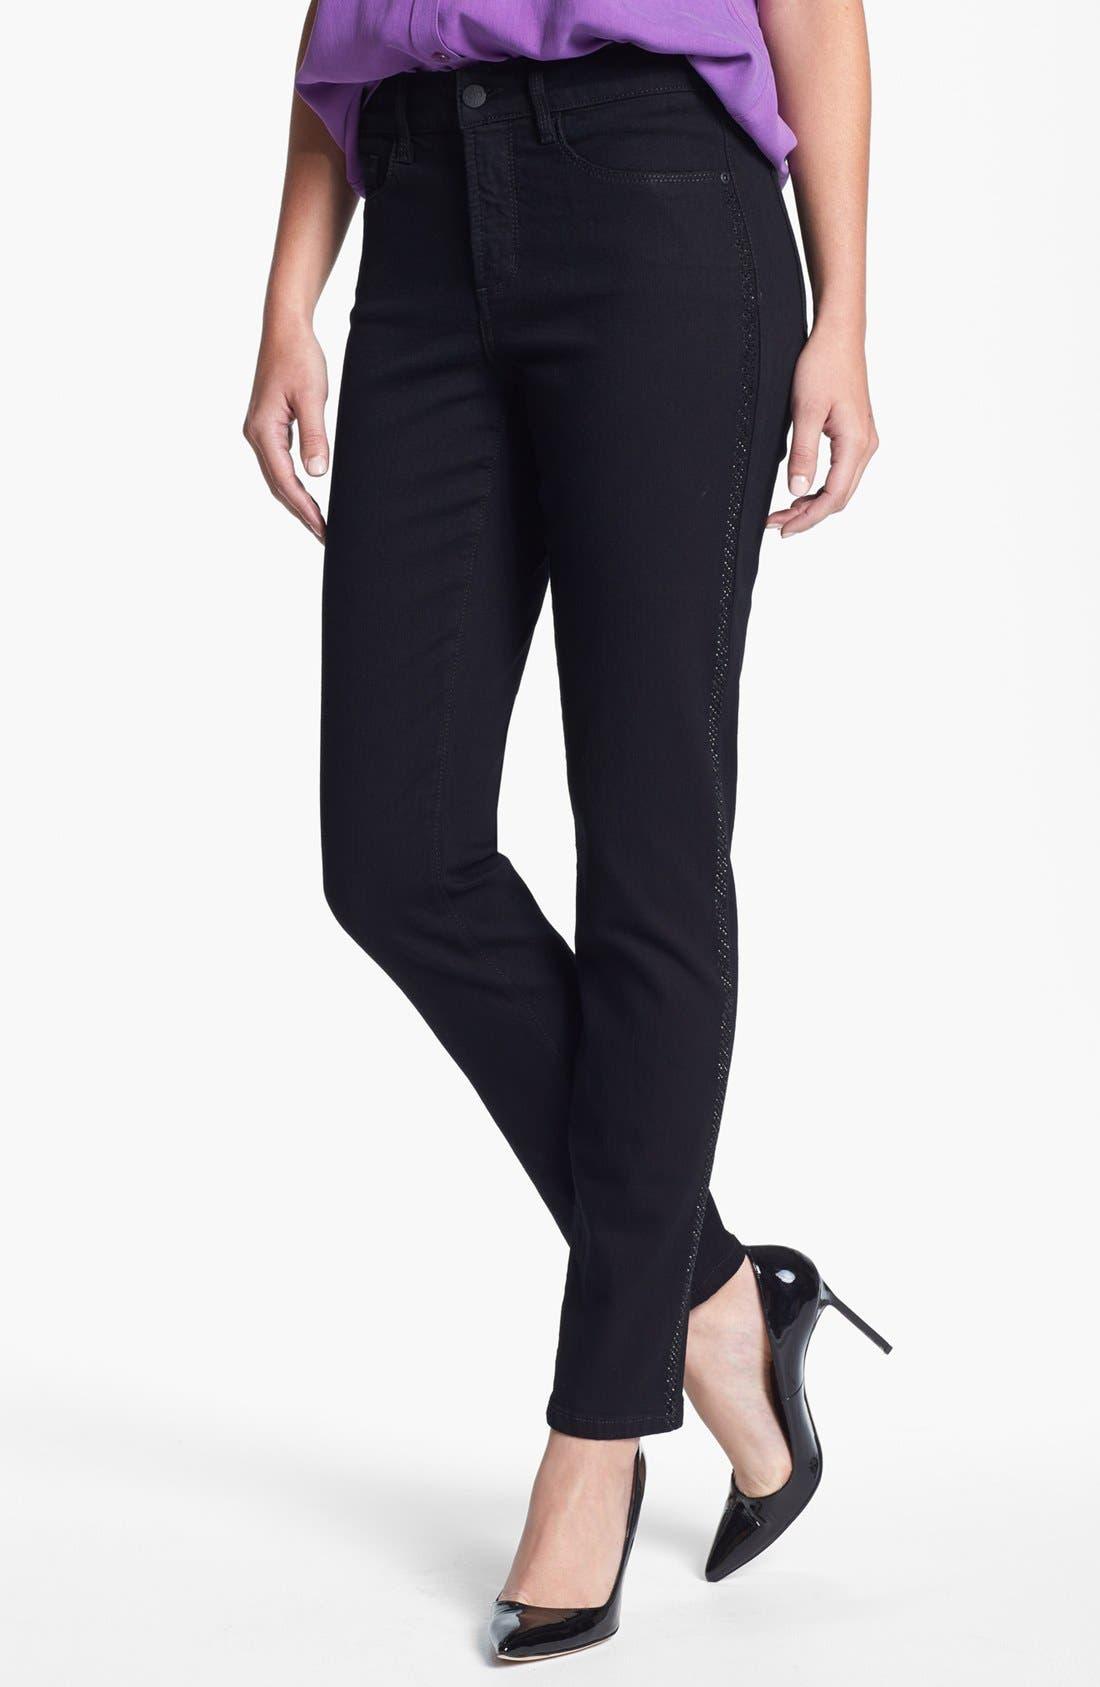 Main Image - NYDJ 'Alina' Embellished Trim Stretch Skinny Jeans (Black)